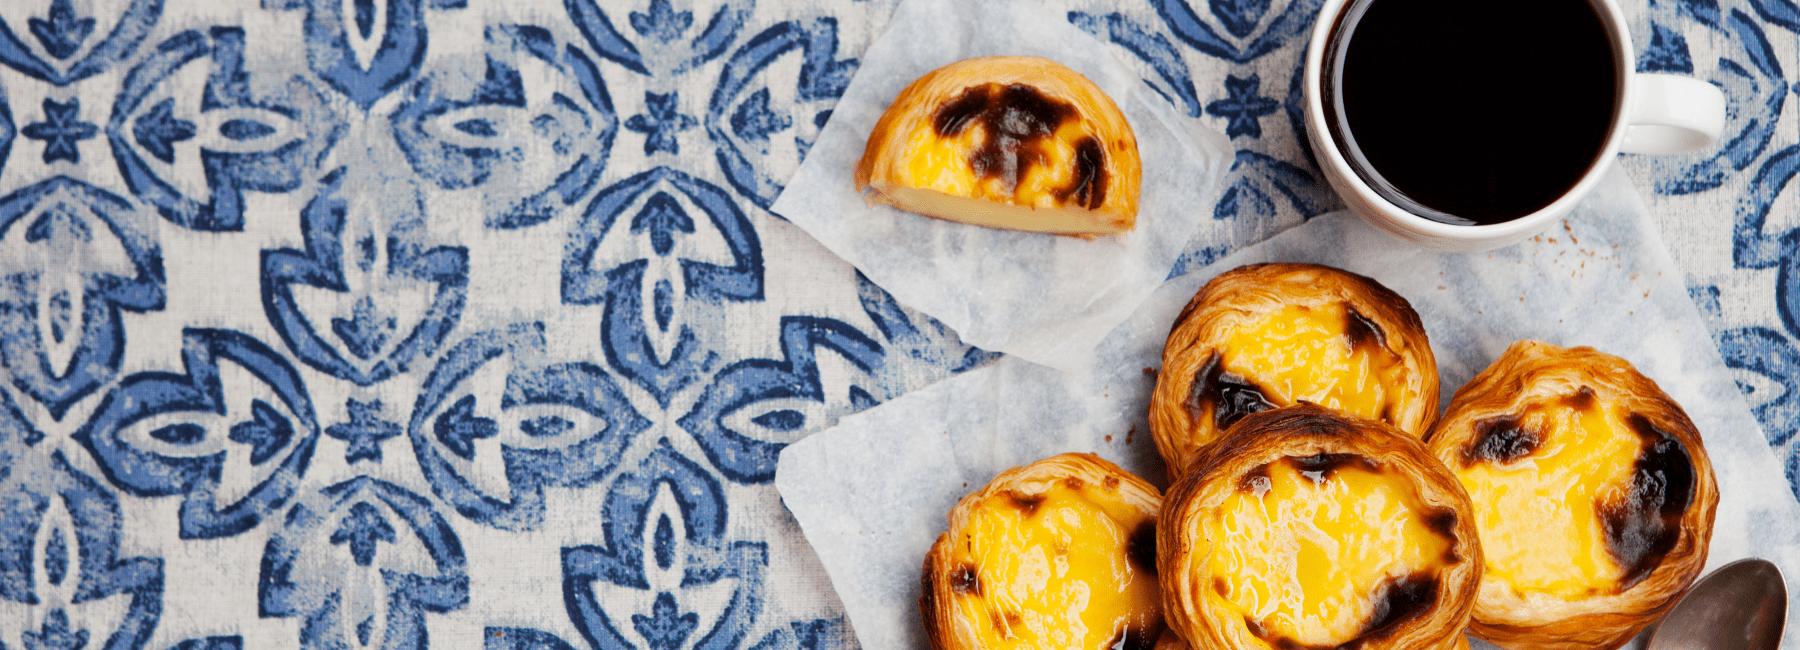 pasteis de nata in lisbon by treasures of lisboa food tours